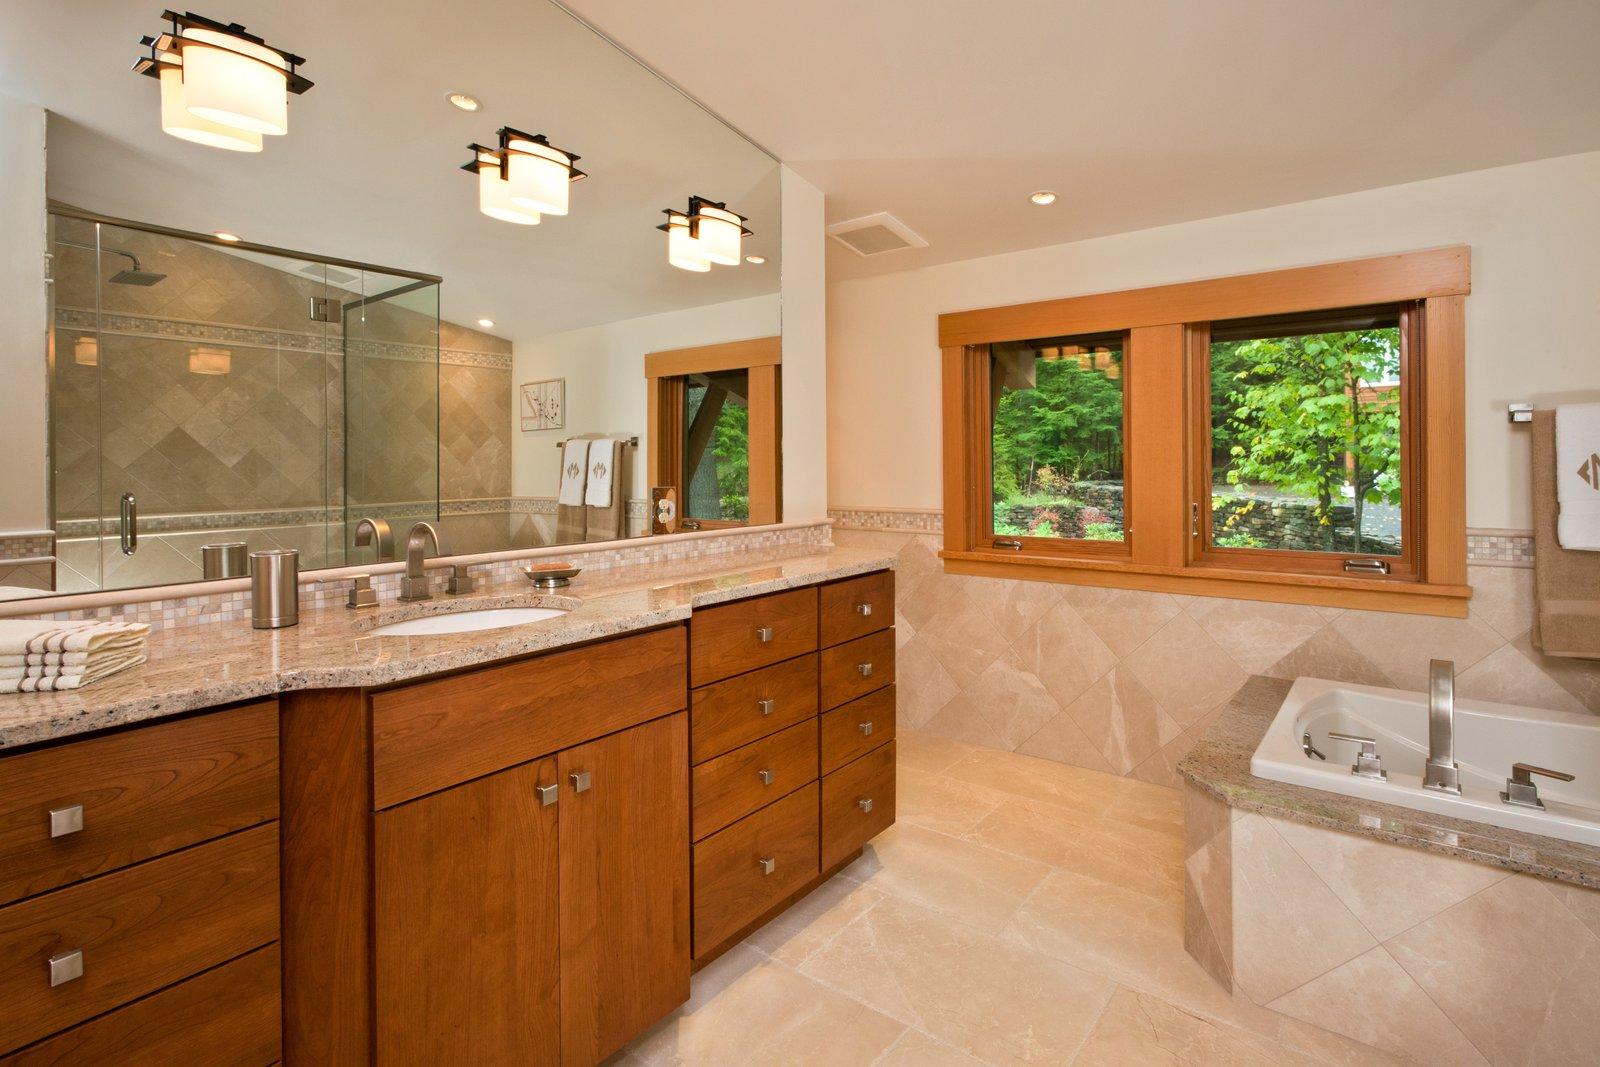 Master bathroom, Lake Luzerne, NY  Fourth Lake Summer House by Phinney Design Group